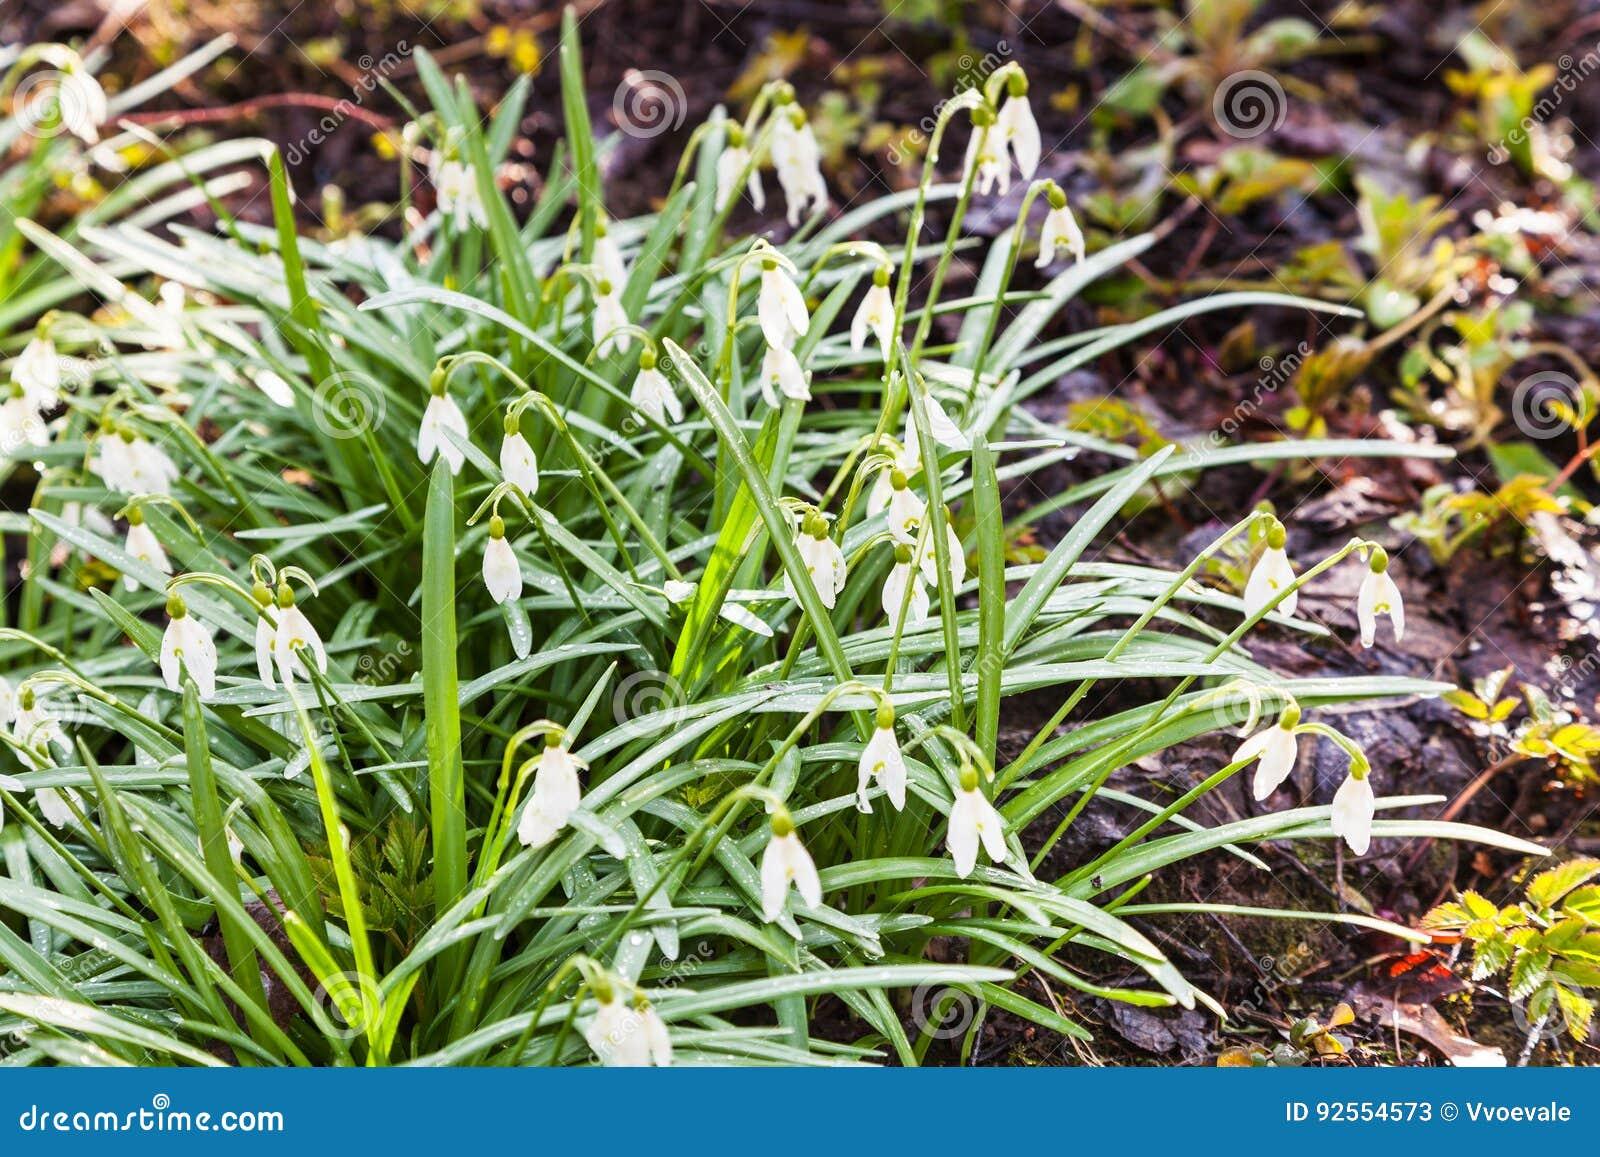 Bush del bucaneve bianco fiorisce su terra bagnata